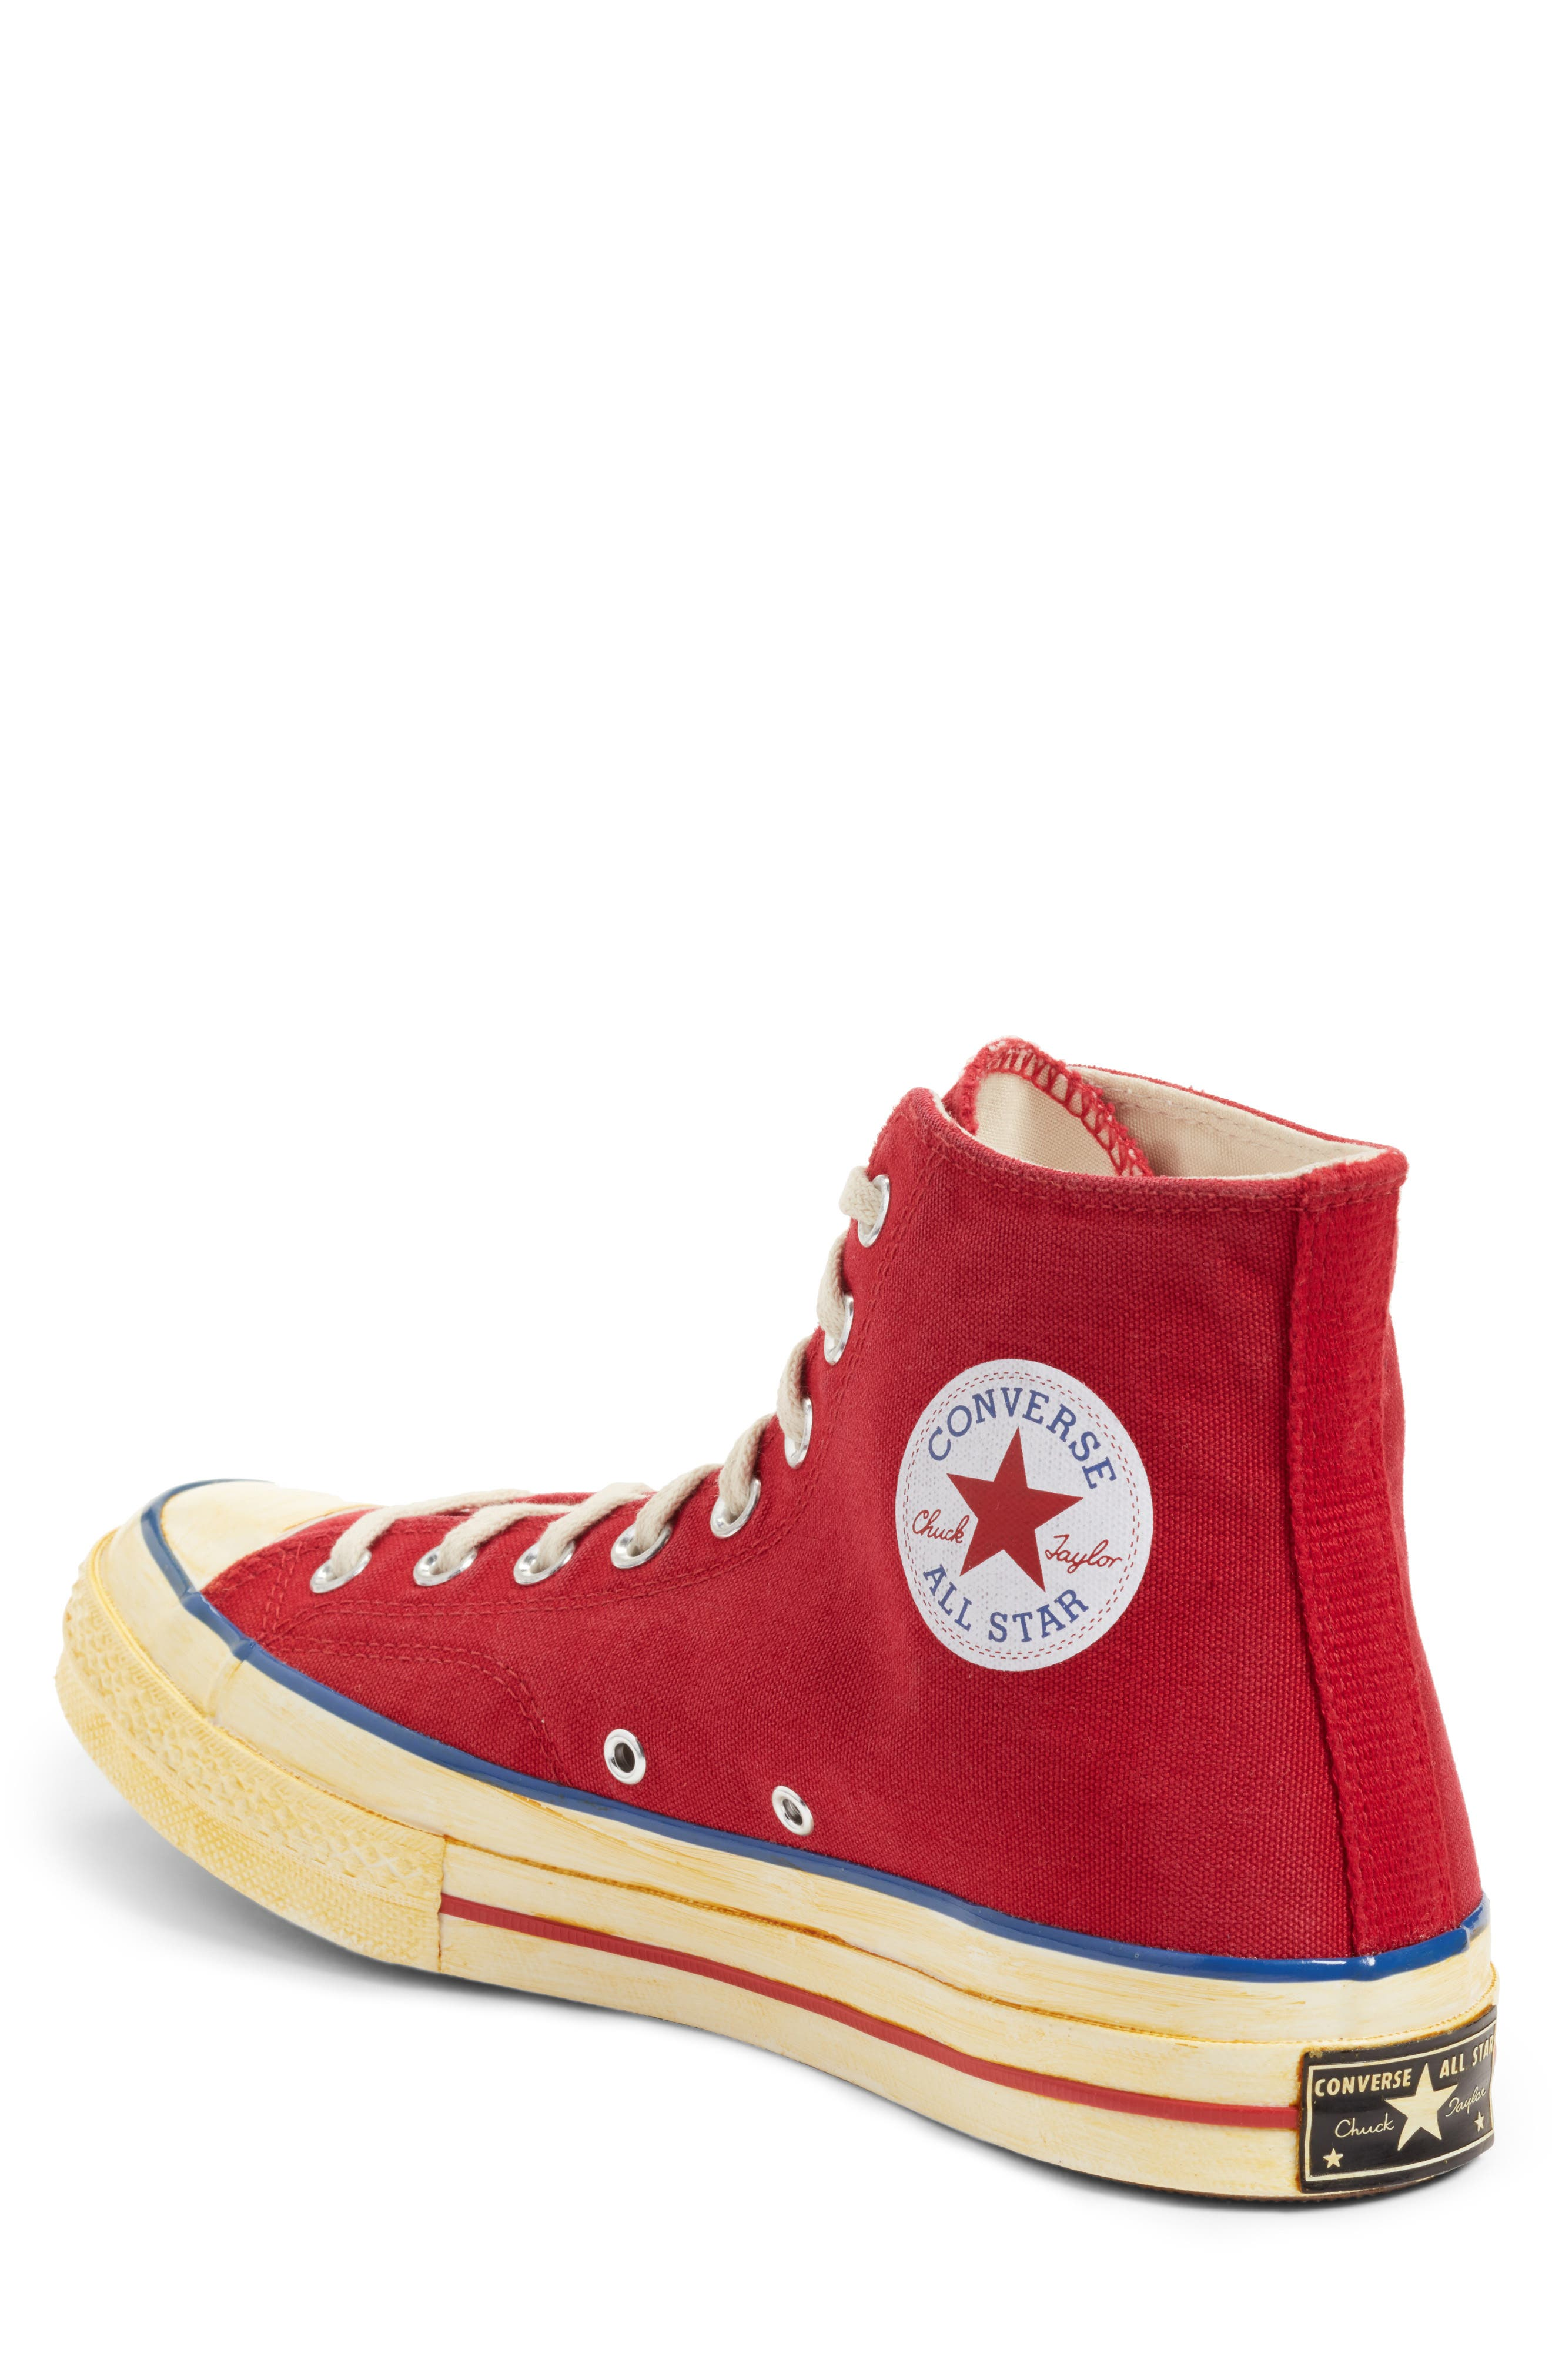 Alternate Image 2  - Converse Chuck Taylor® All Star® 70 High Top Sneaker (Men)